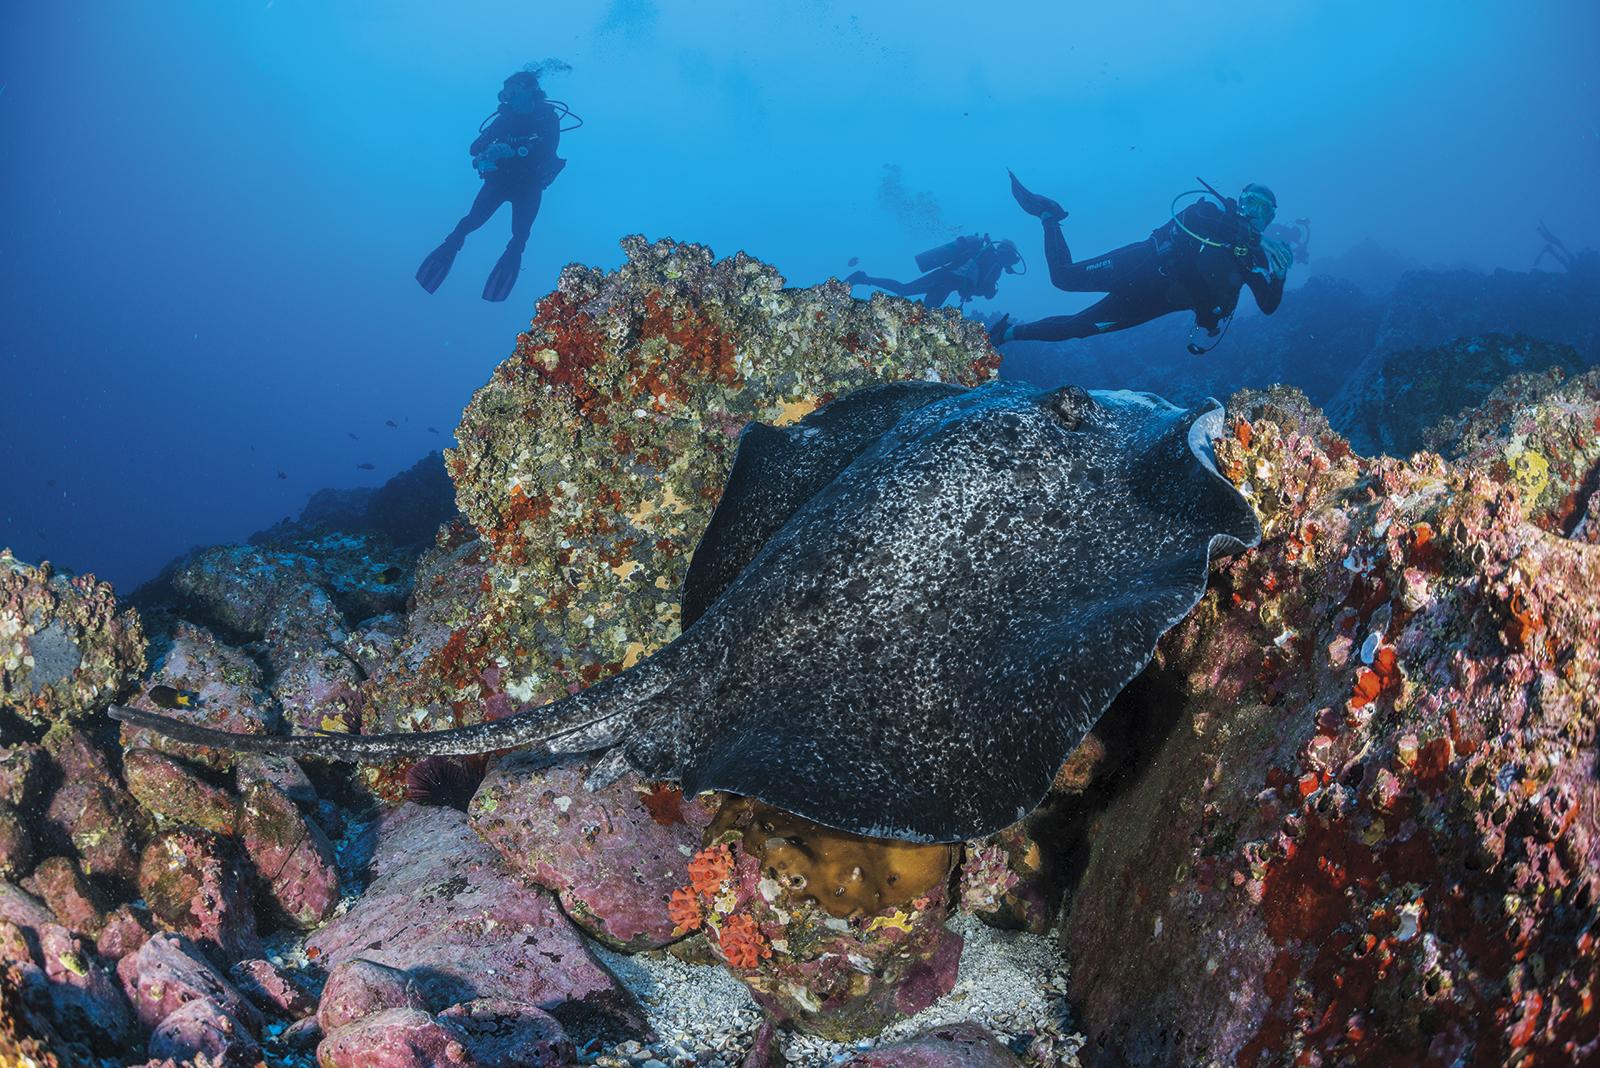 Marbled ray, Small Dos Amigos,Cocos Island, Costa Rica